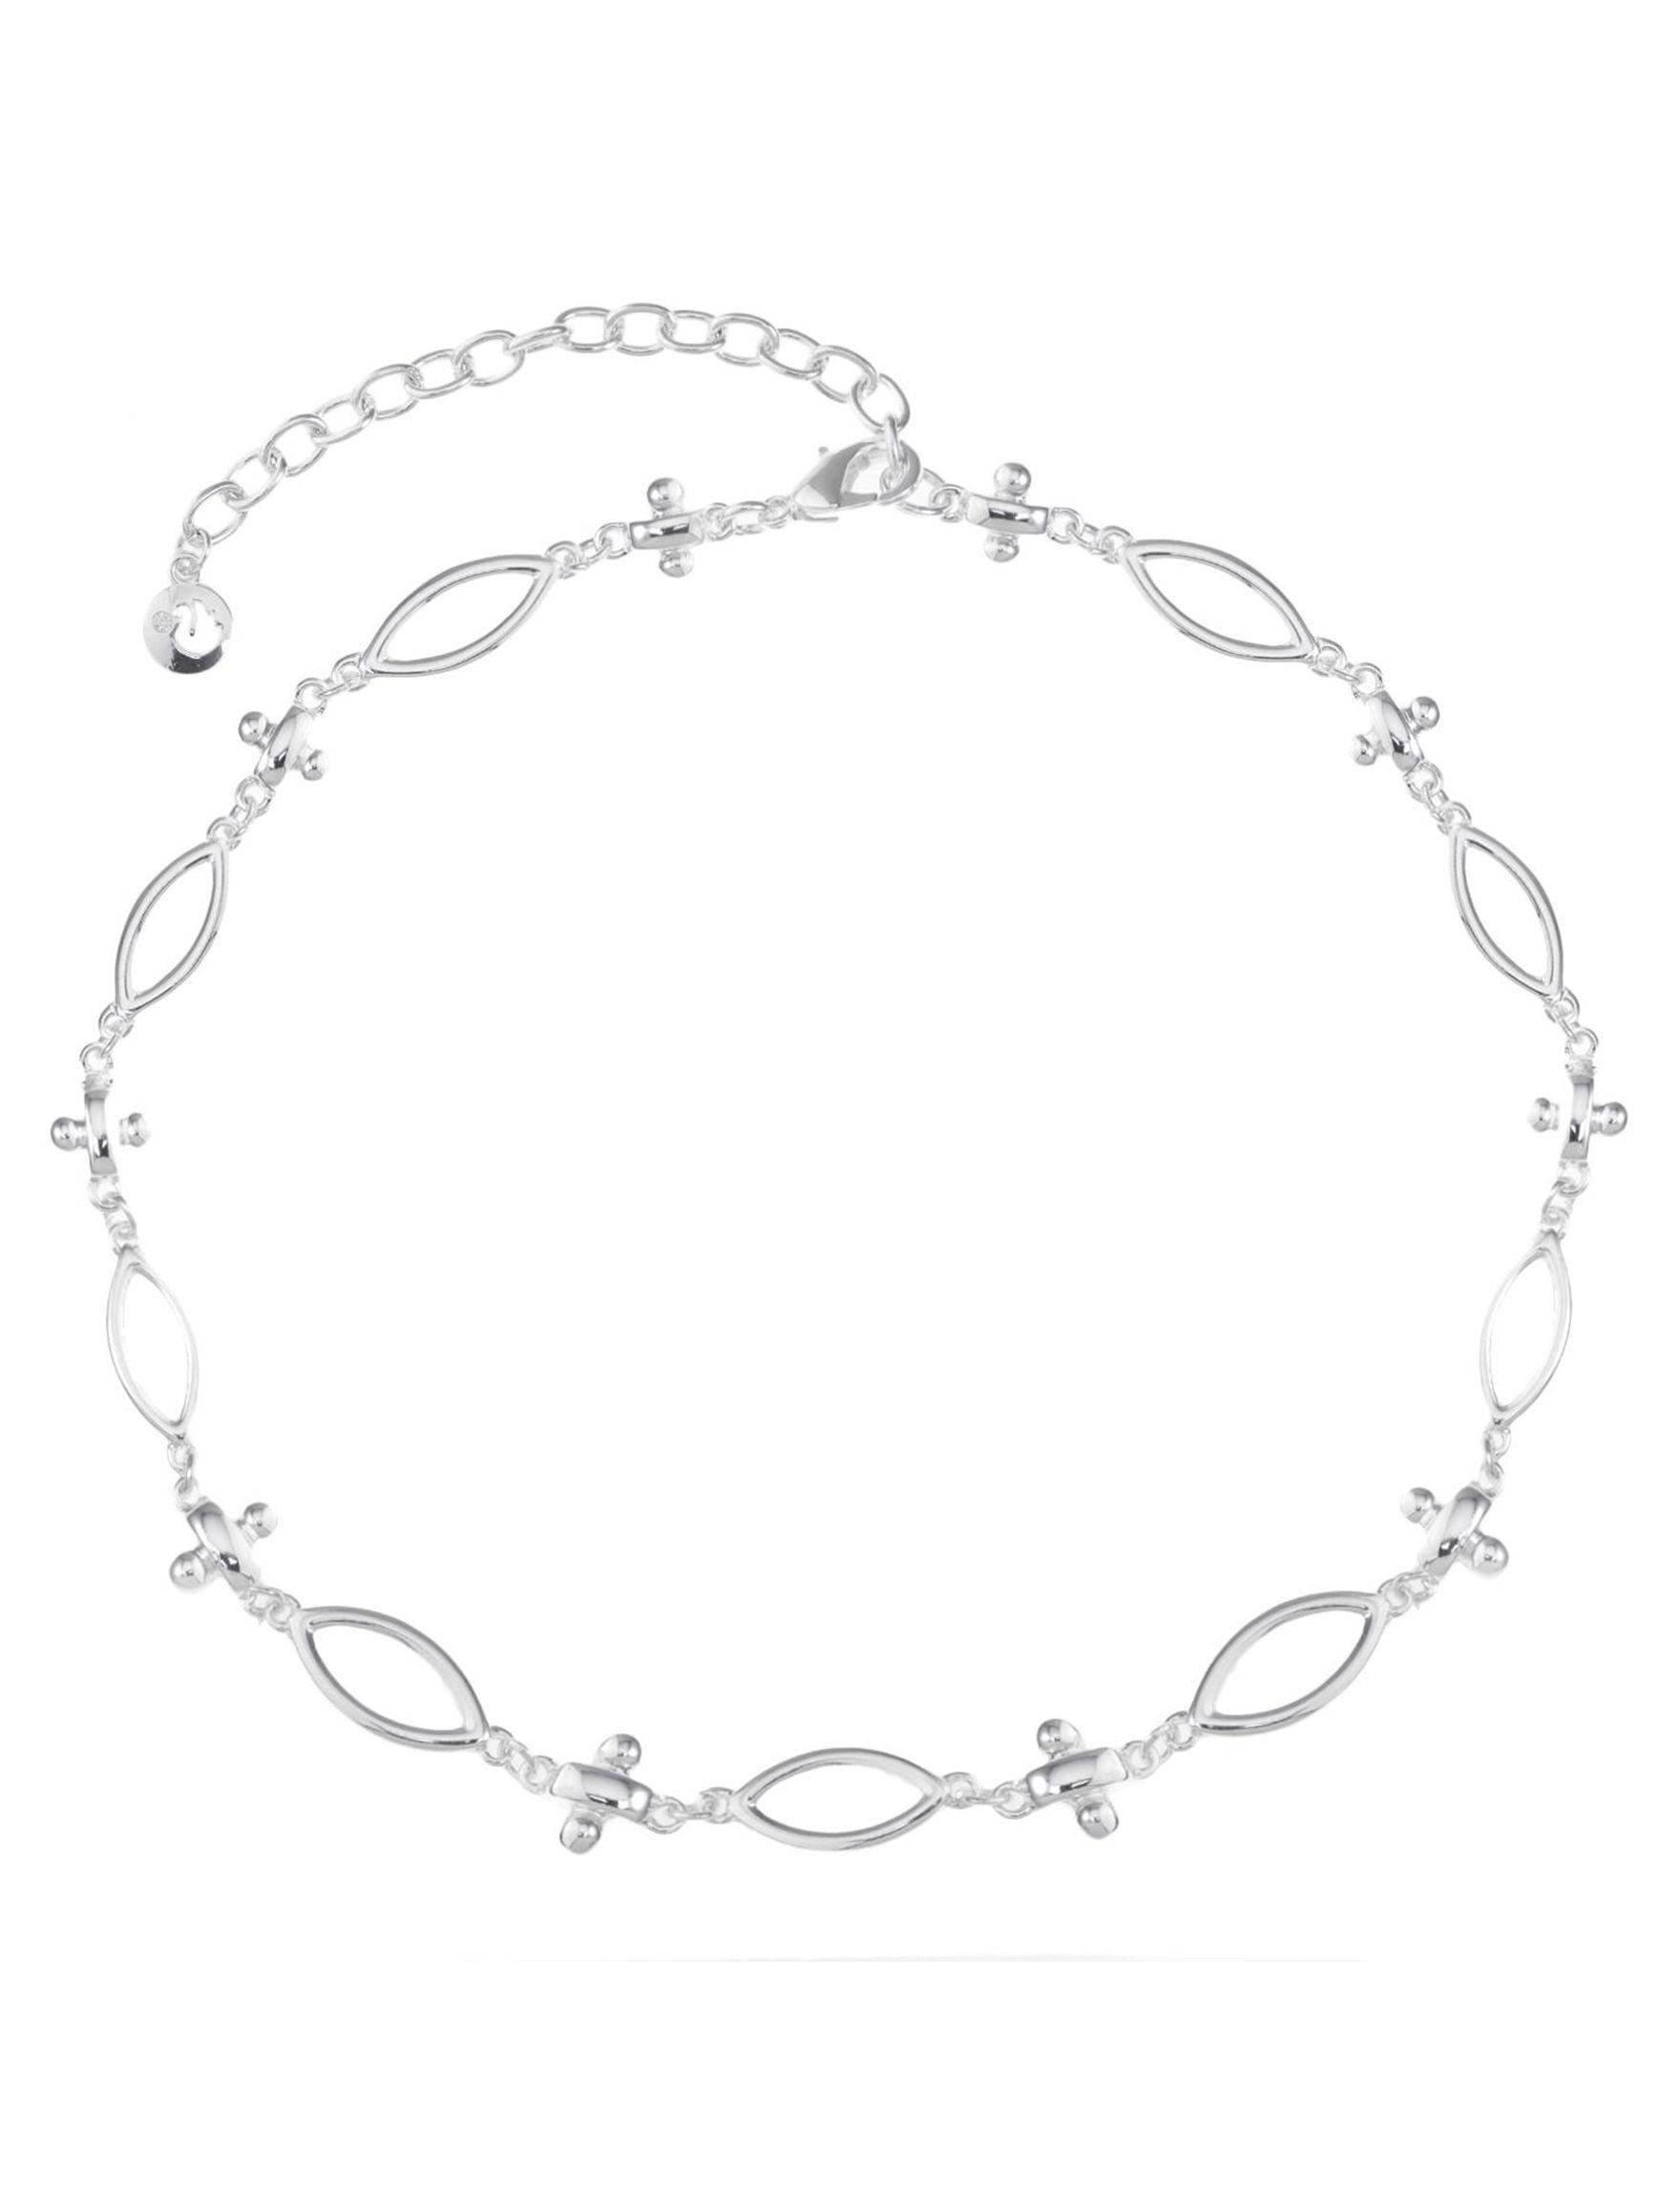 Gloria Vanderbilt Silver Necklaces & Pendants Fashion Jewelry